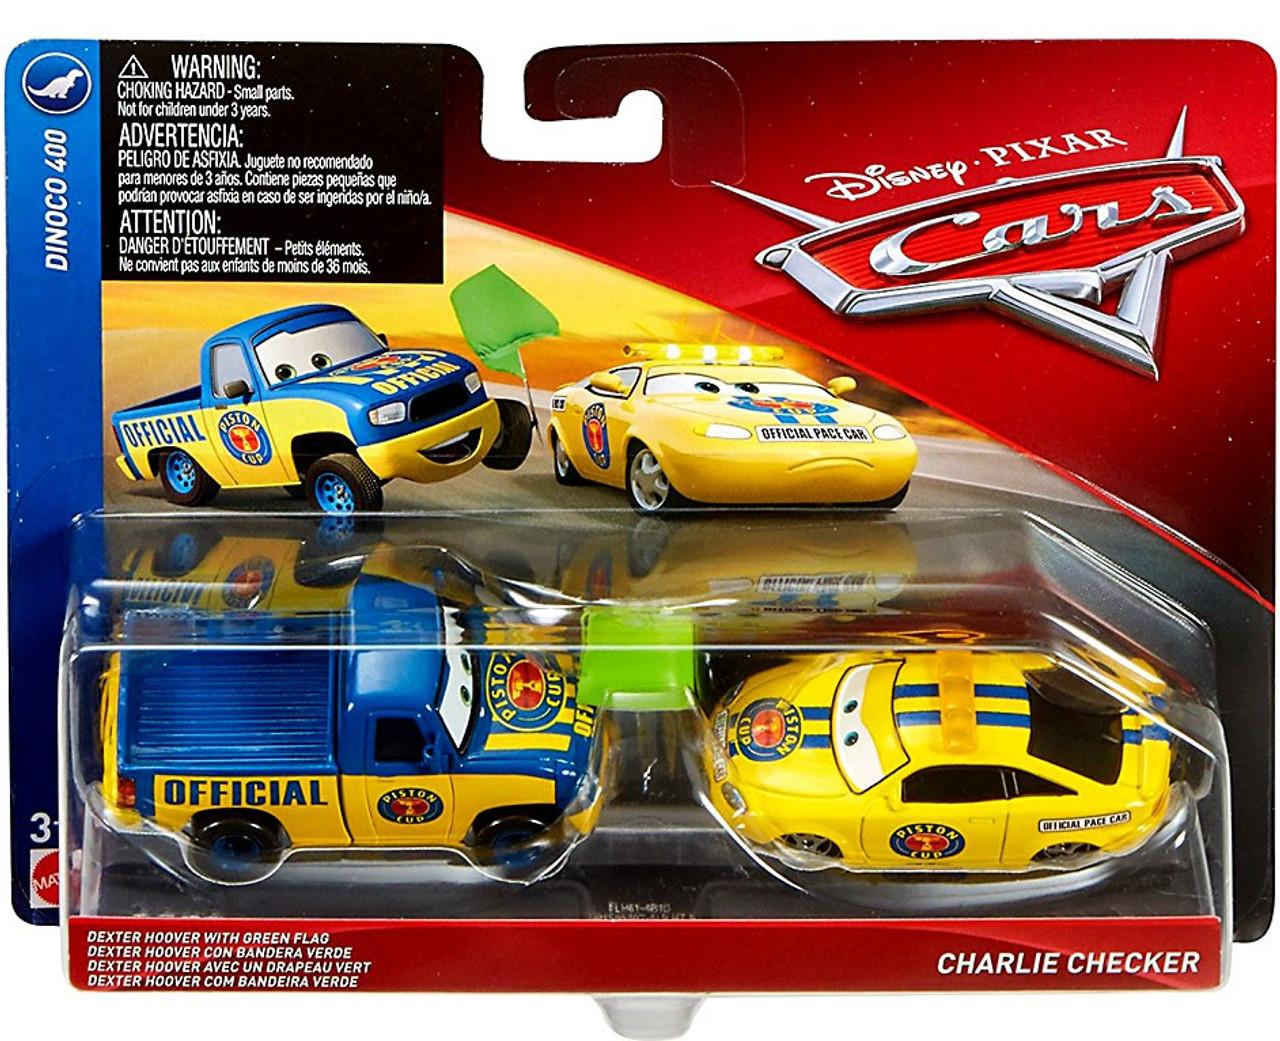 Disney Cars Cars 3 Dinoco 400 Dexter Hoover Green Flag